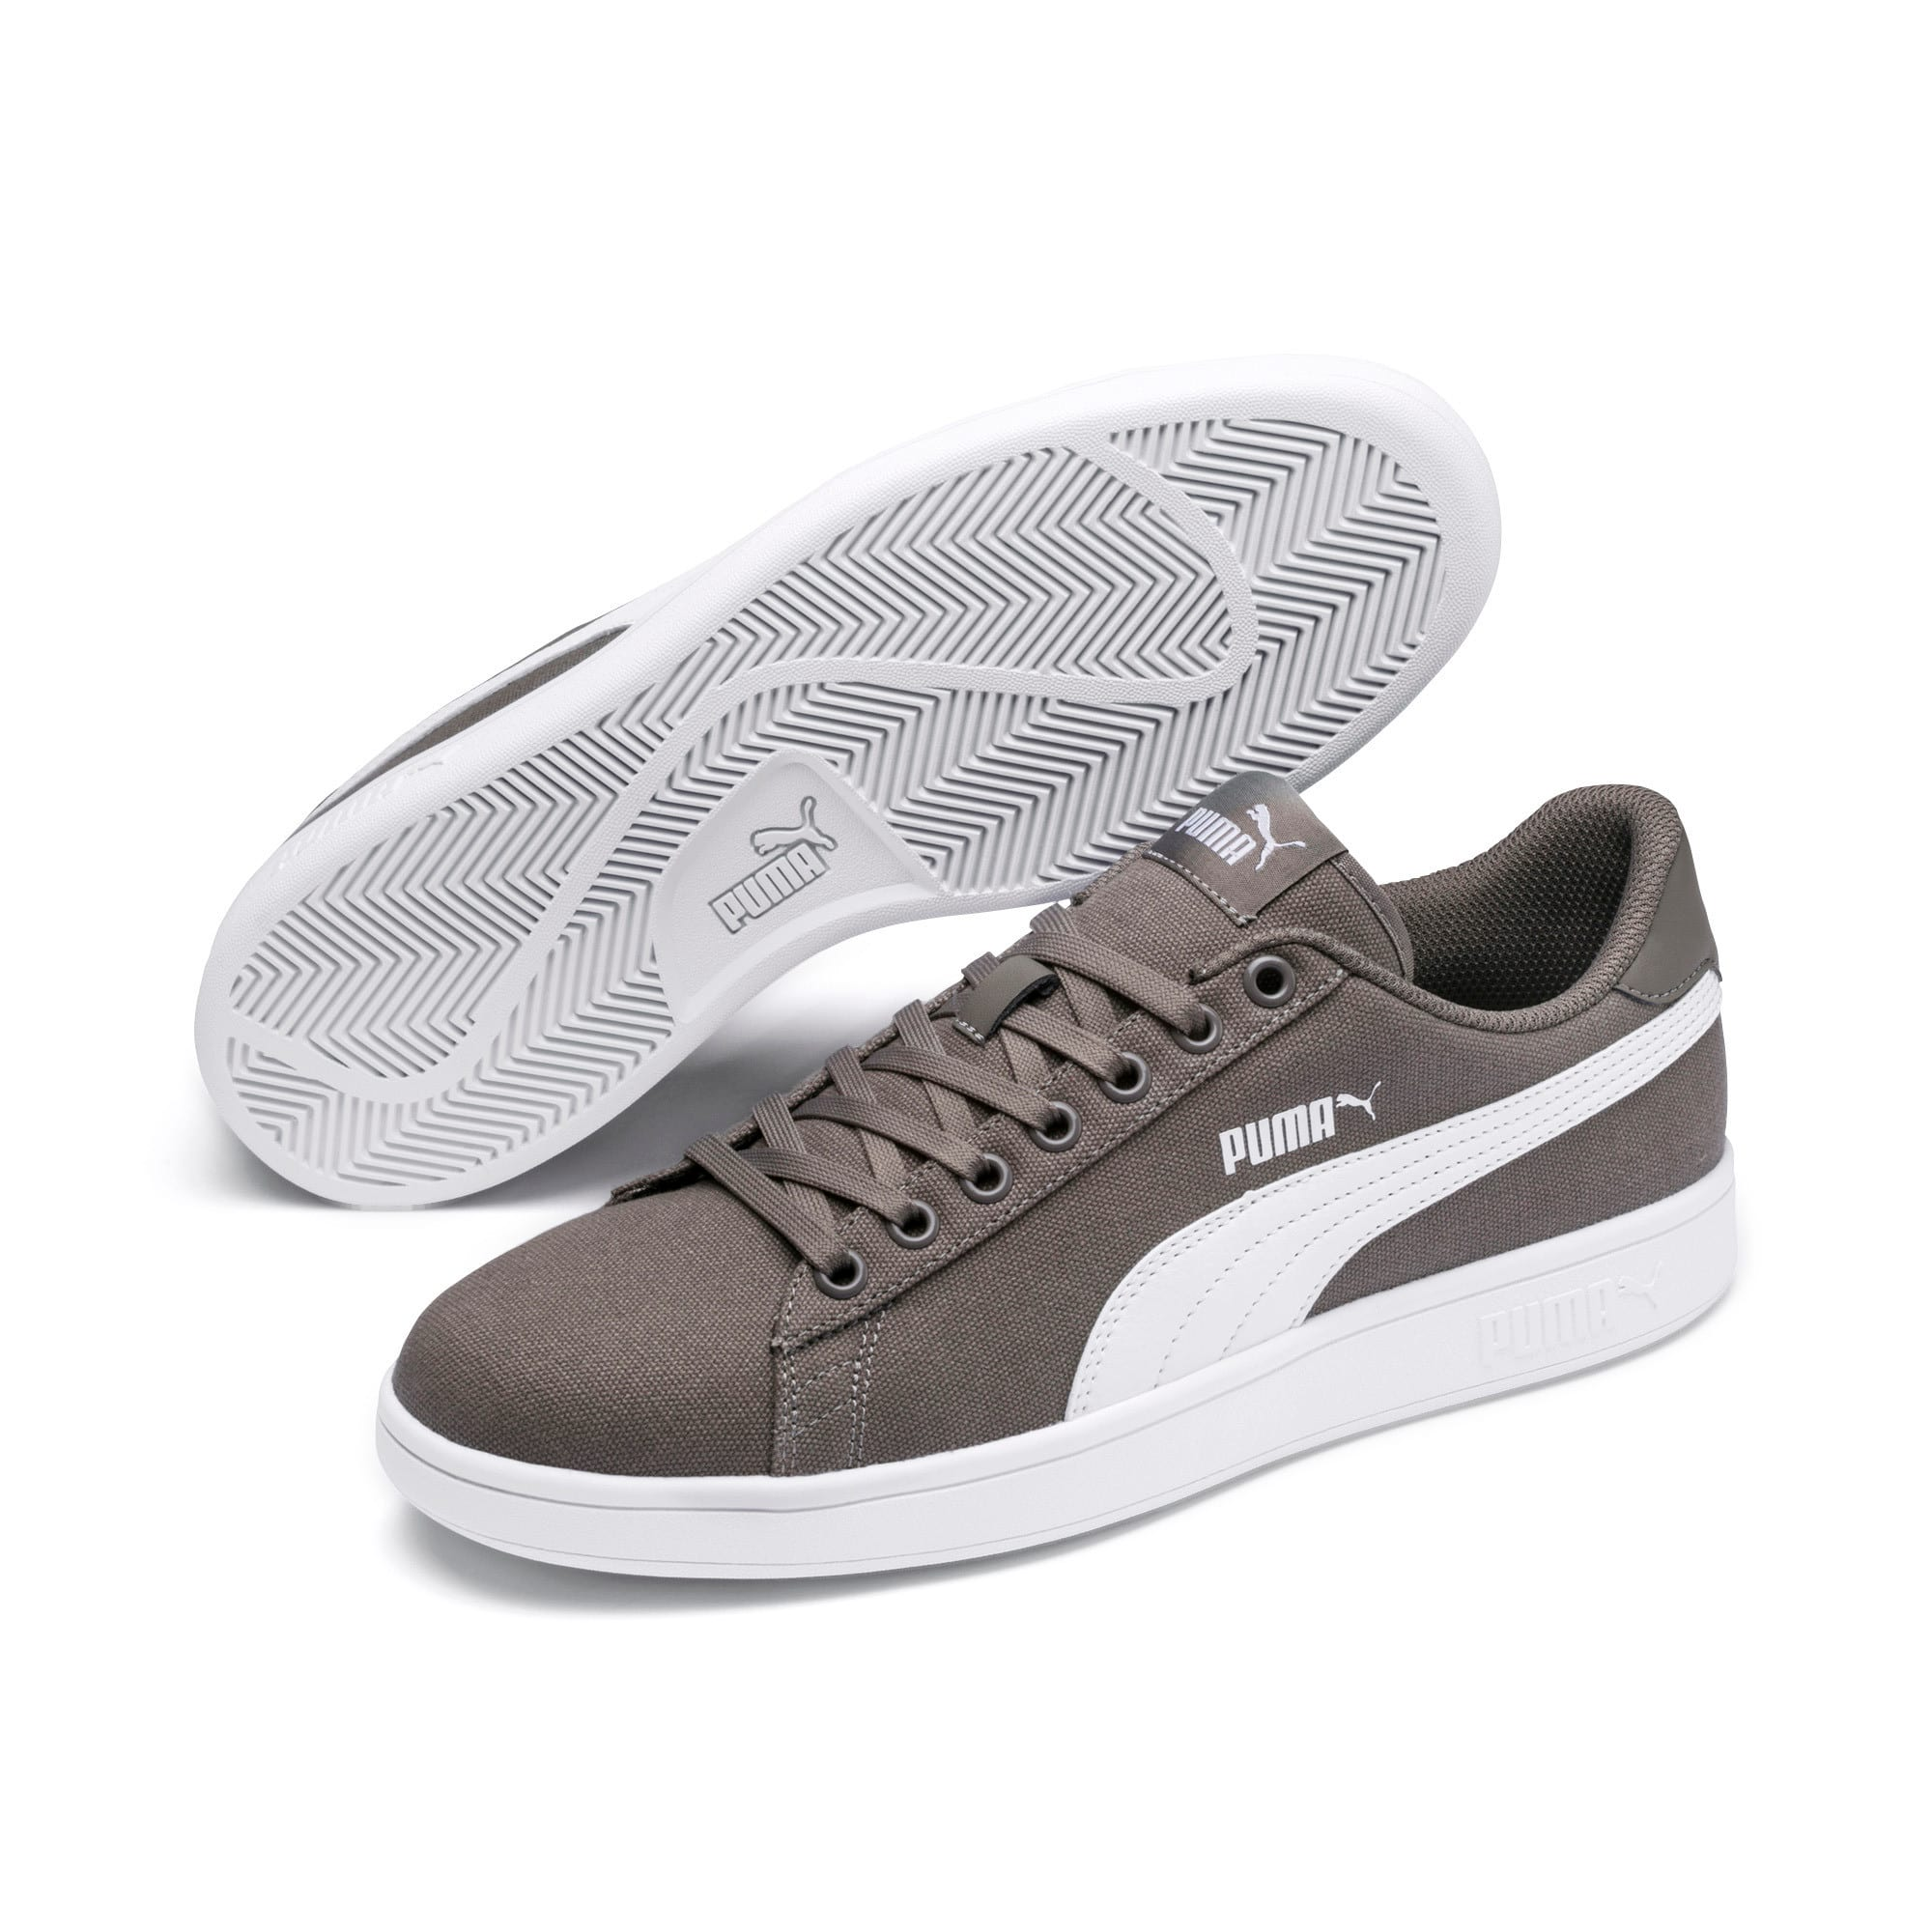 Thumbnail 2 of PUMA Smash v2 Canvas Sneakers, Charcoal Gray-Puma White, medium